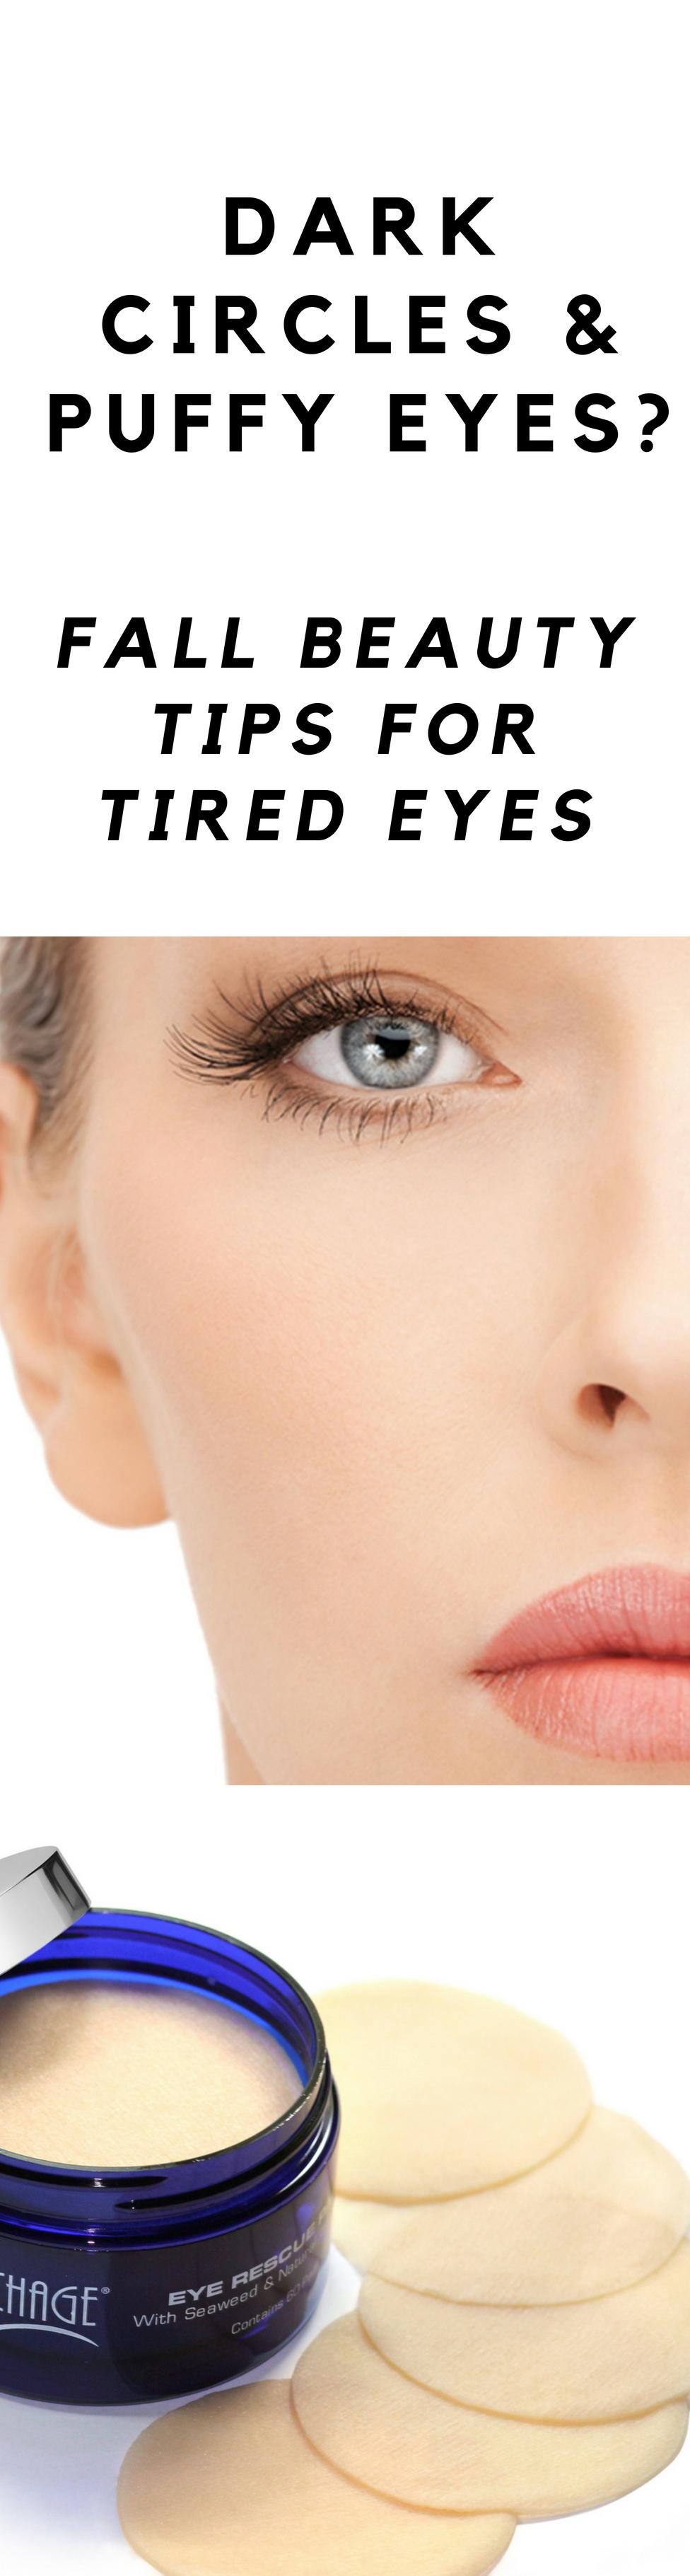 Dark Under Eye Circles and Puffy Eyes? Fall Beauty Tips